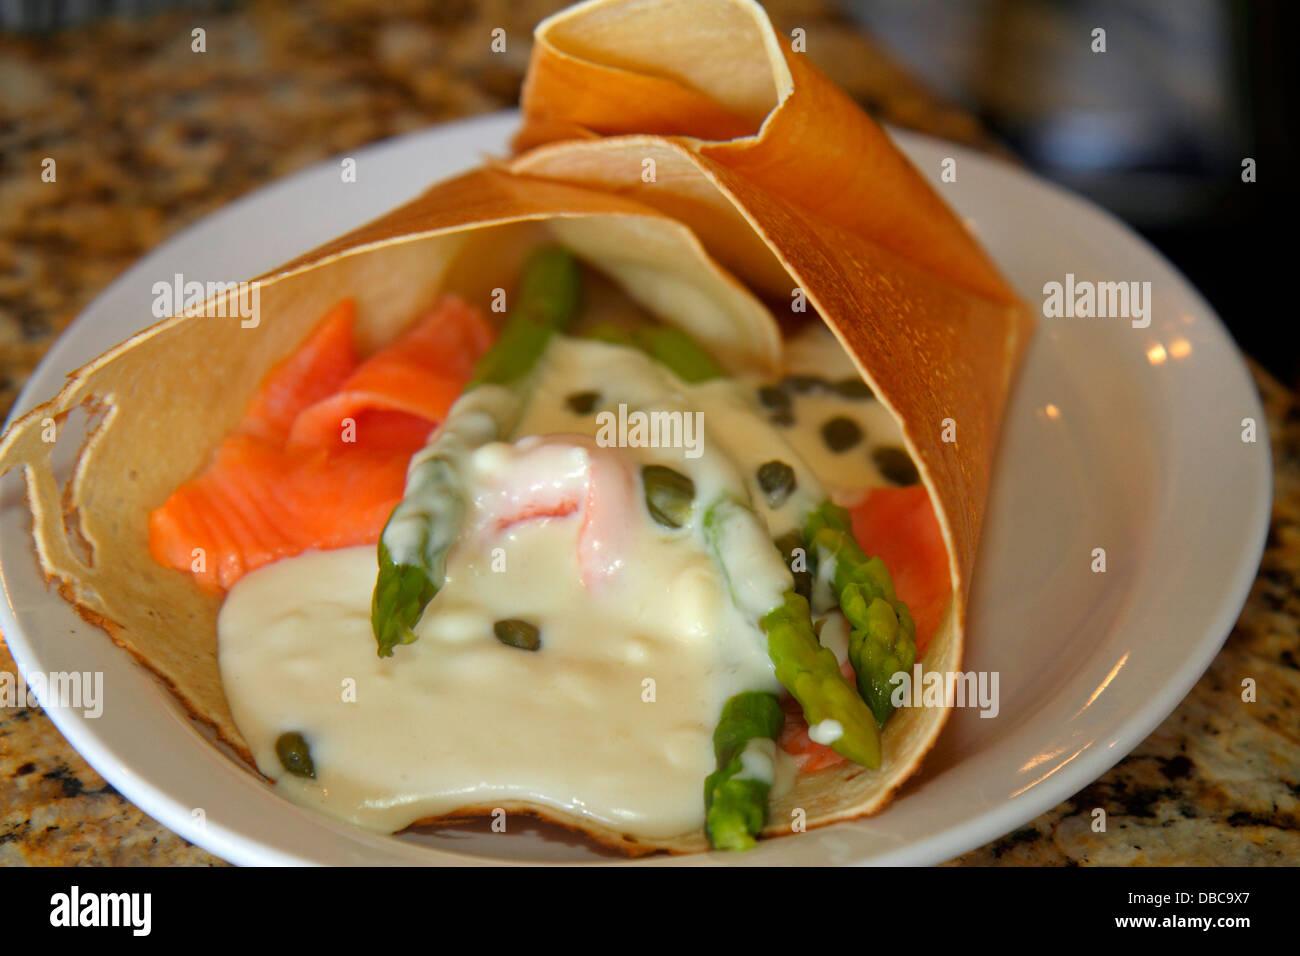 Florida Las Olas Boulevard La Bonne Crepe Restaurant Im Inneren Teller